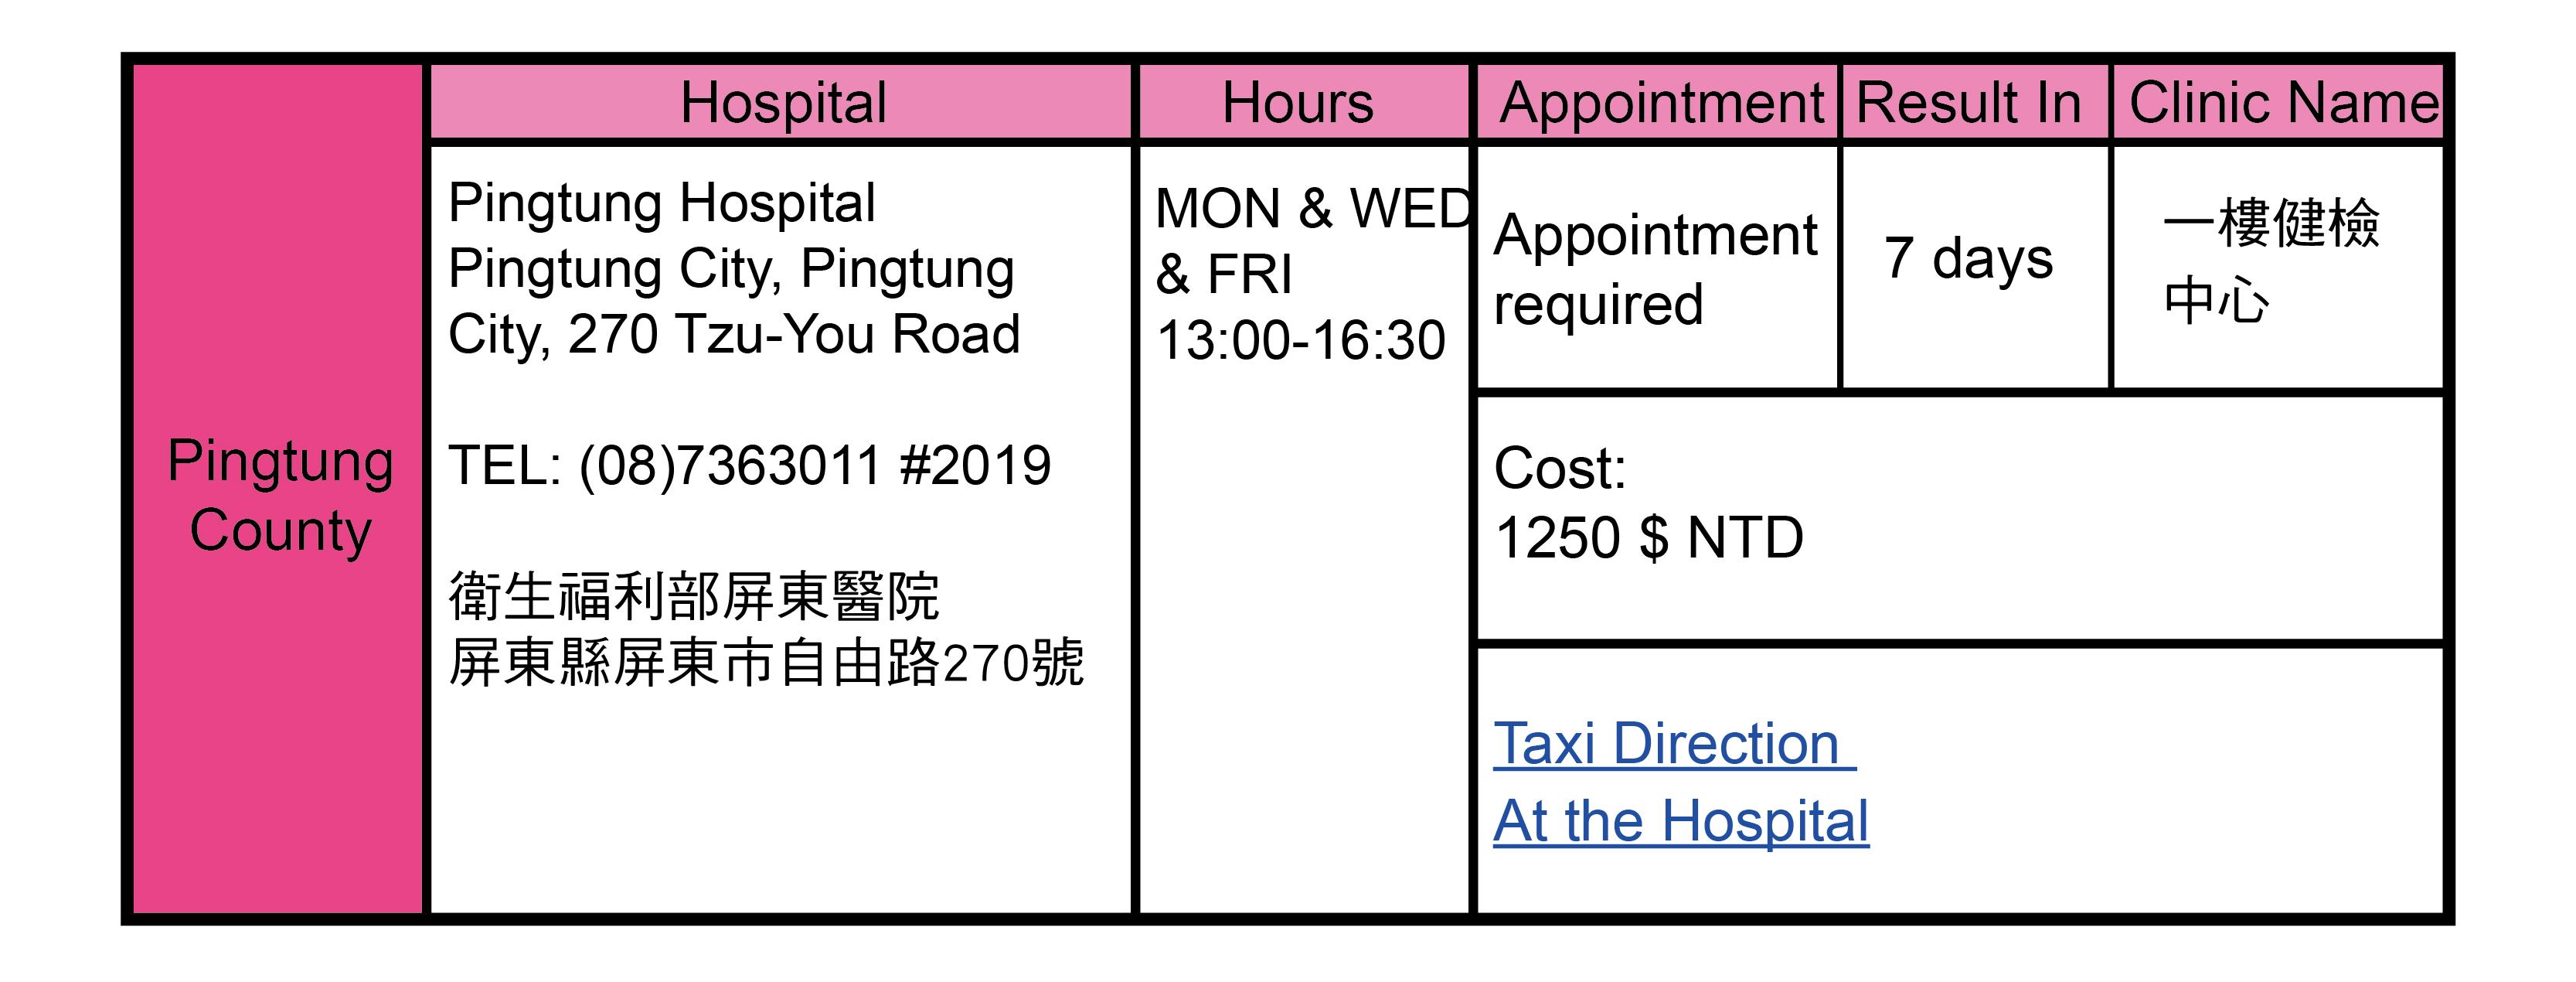 Pingtung County, Taiwan Health Check Hospitals Addresses